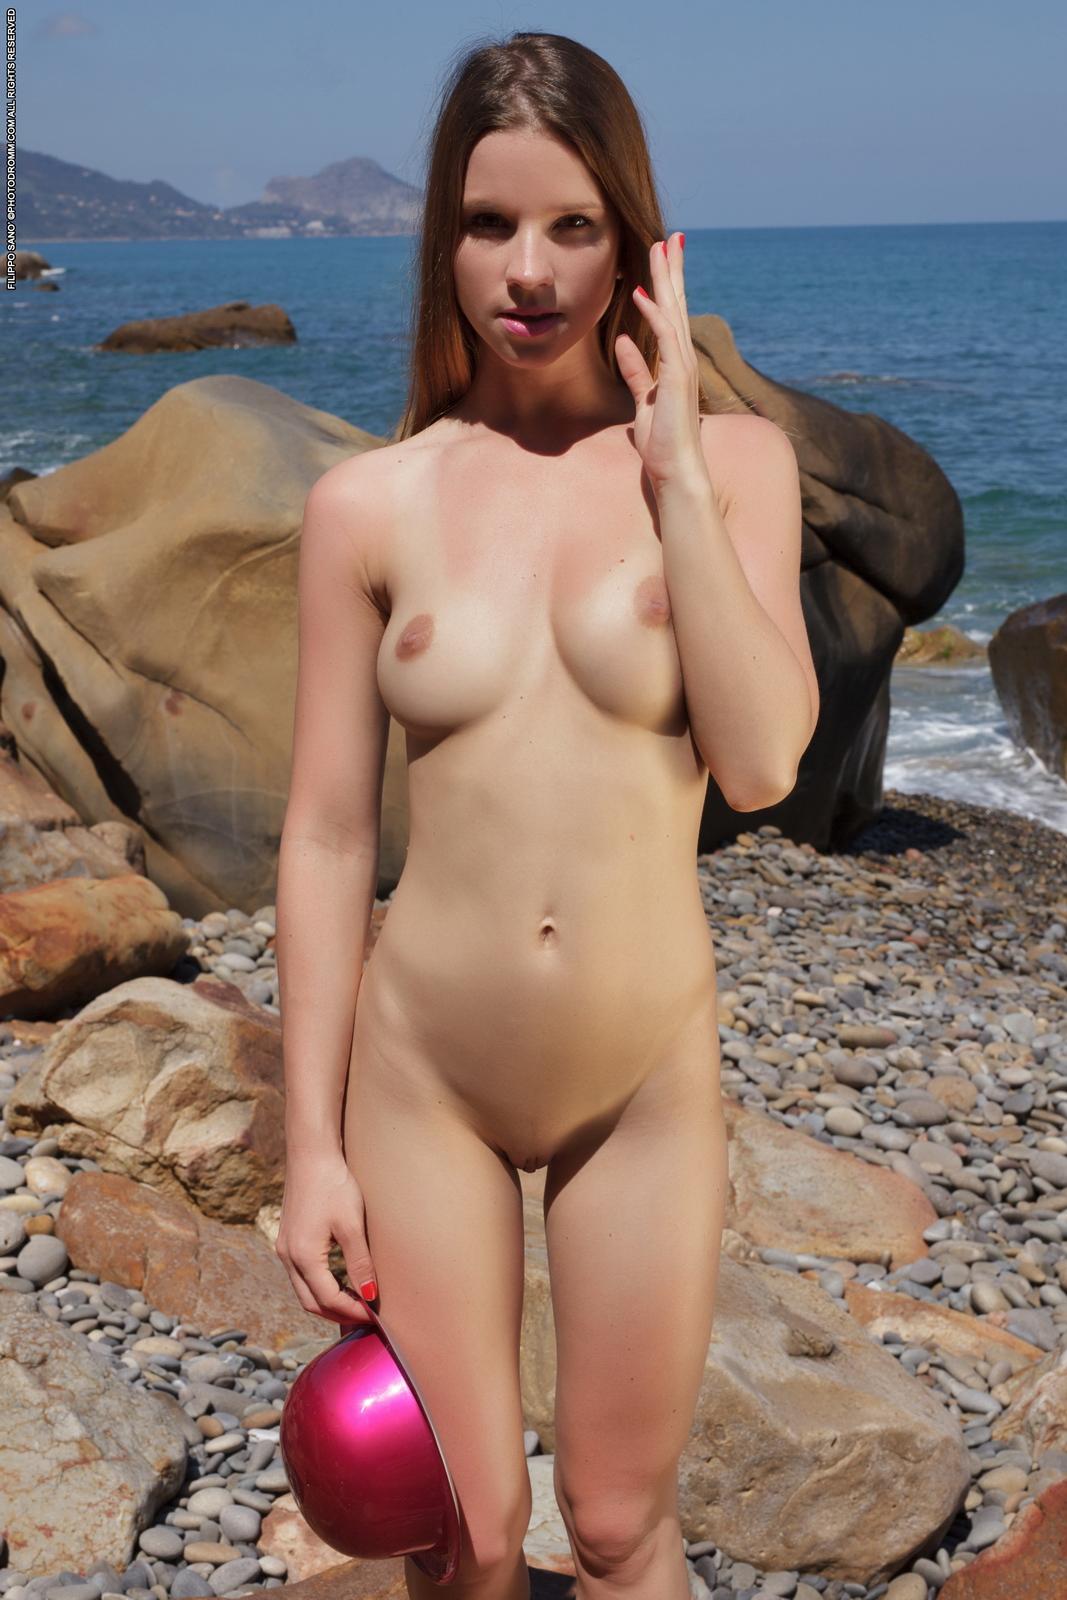 amanda-seaside-beach-nude-photodromm-17